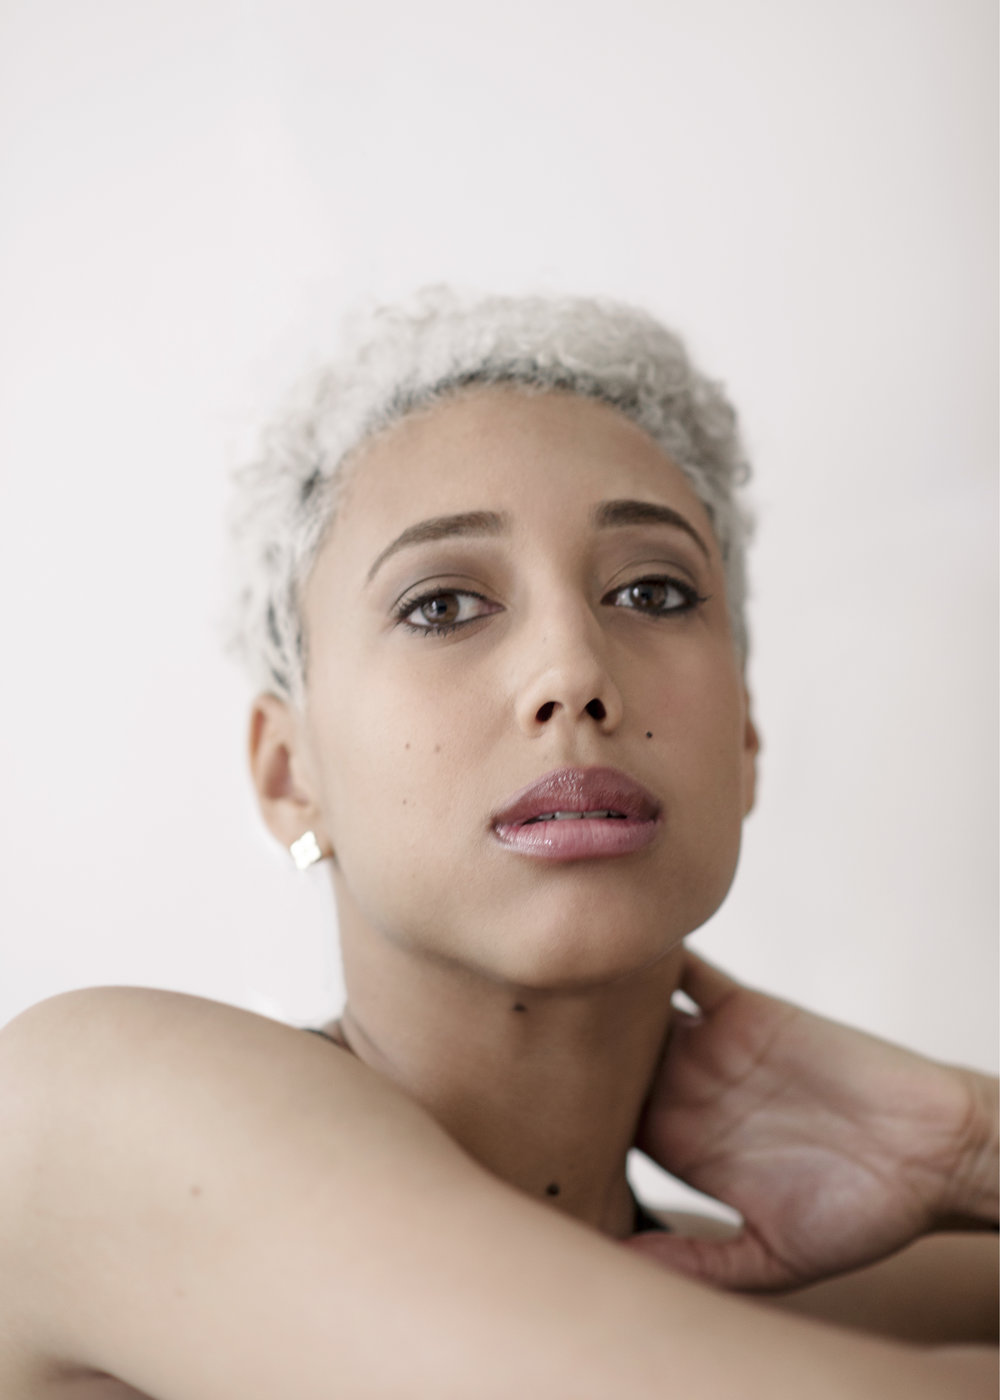 Miriam / Singer, Songwriter